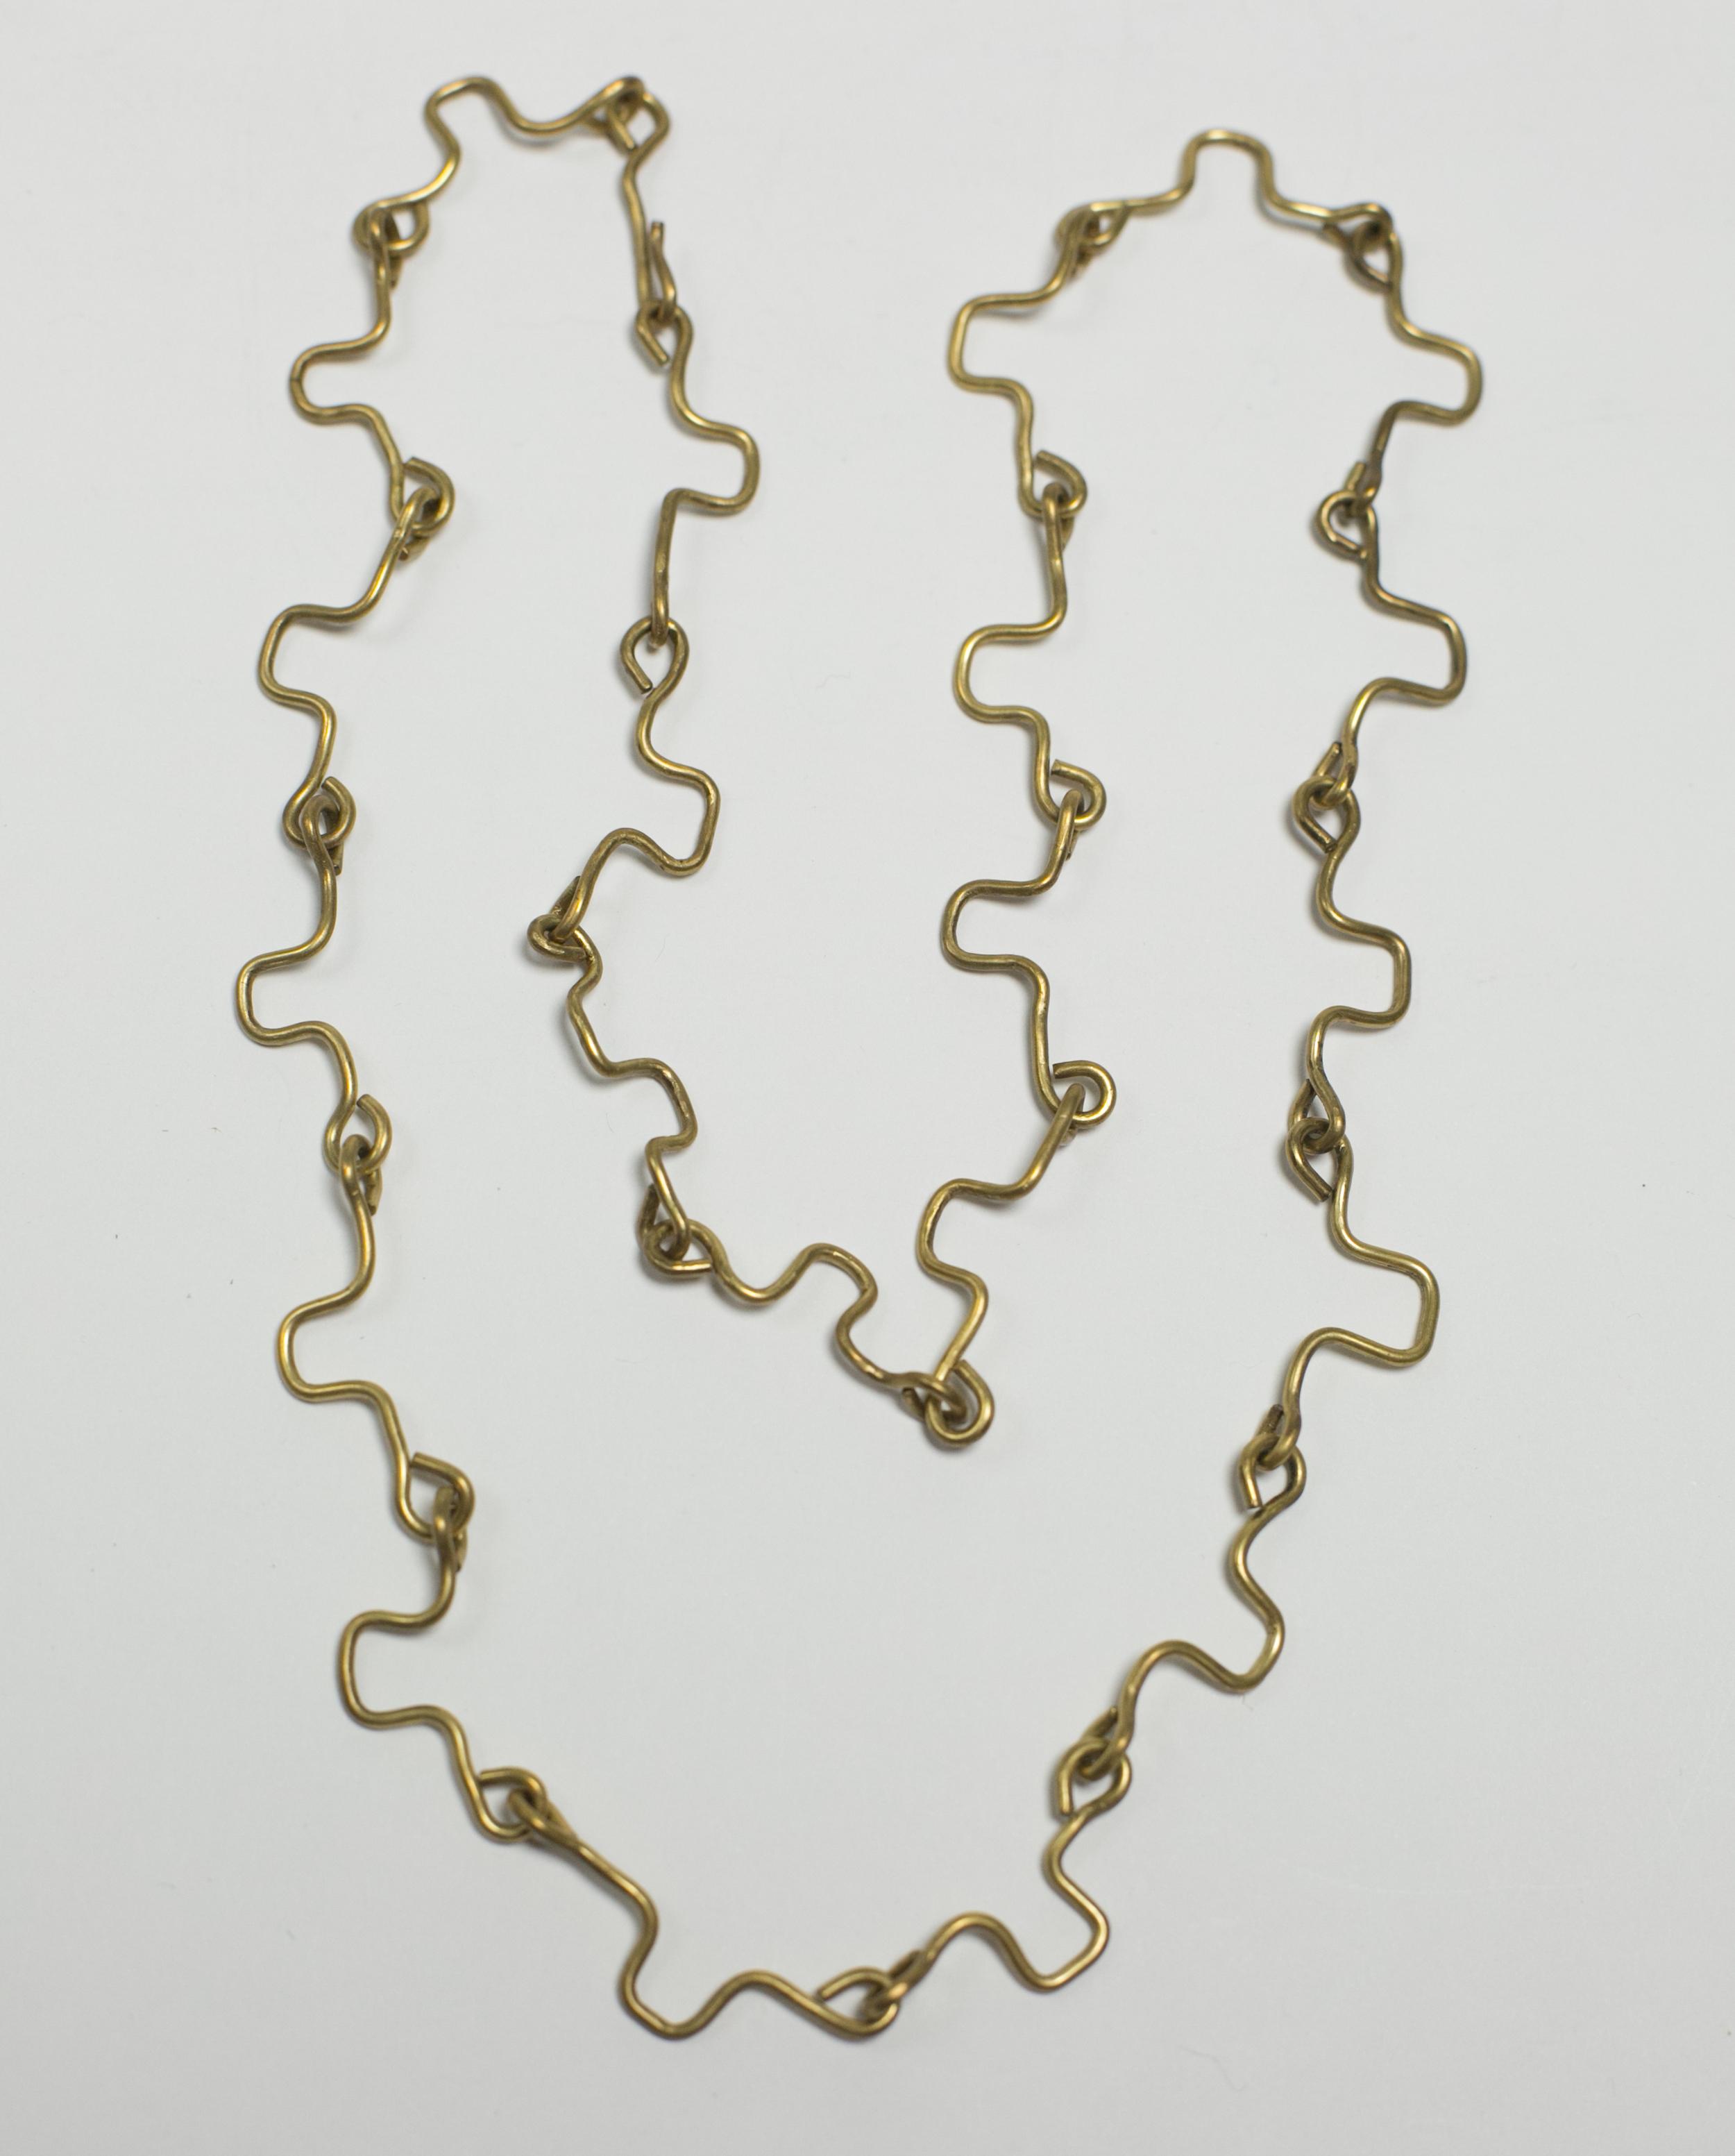 Sumerian Key Chain